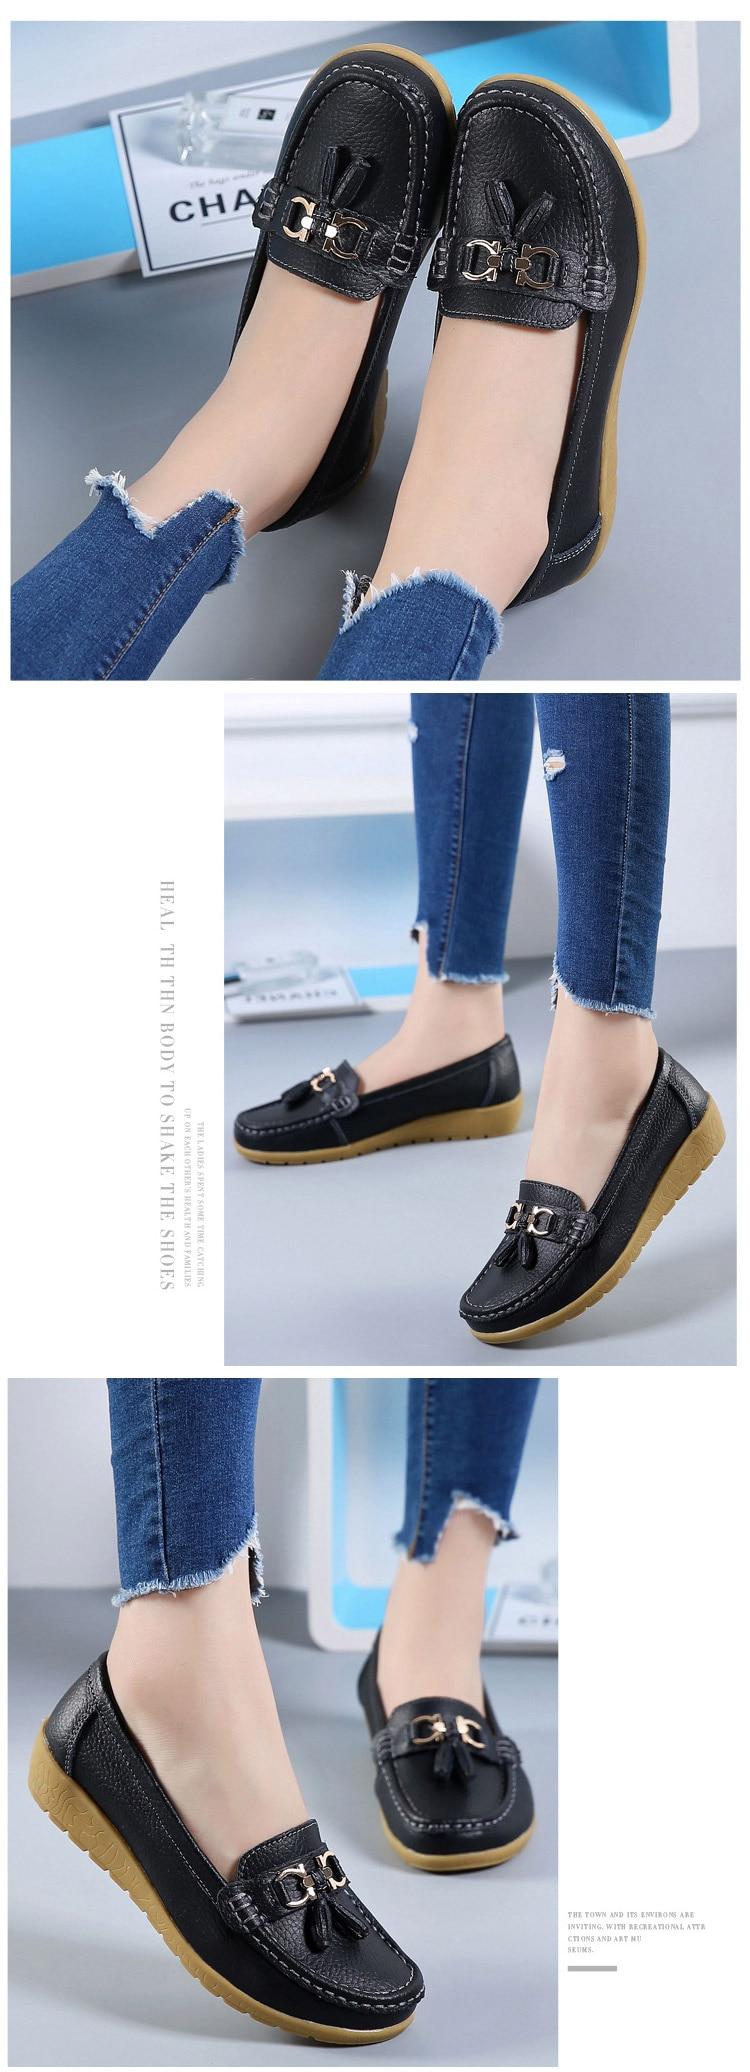 Spring women genuine leather shoes HTB1XAC9fTqWBKNjSZFAq6ynSpXaV